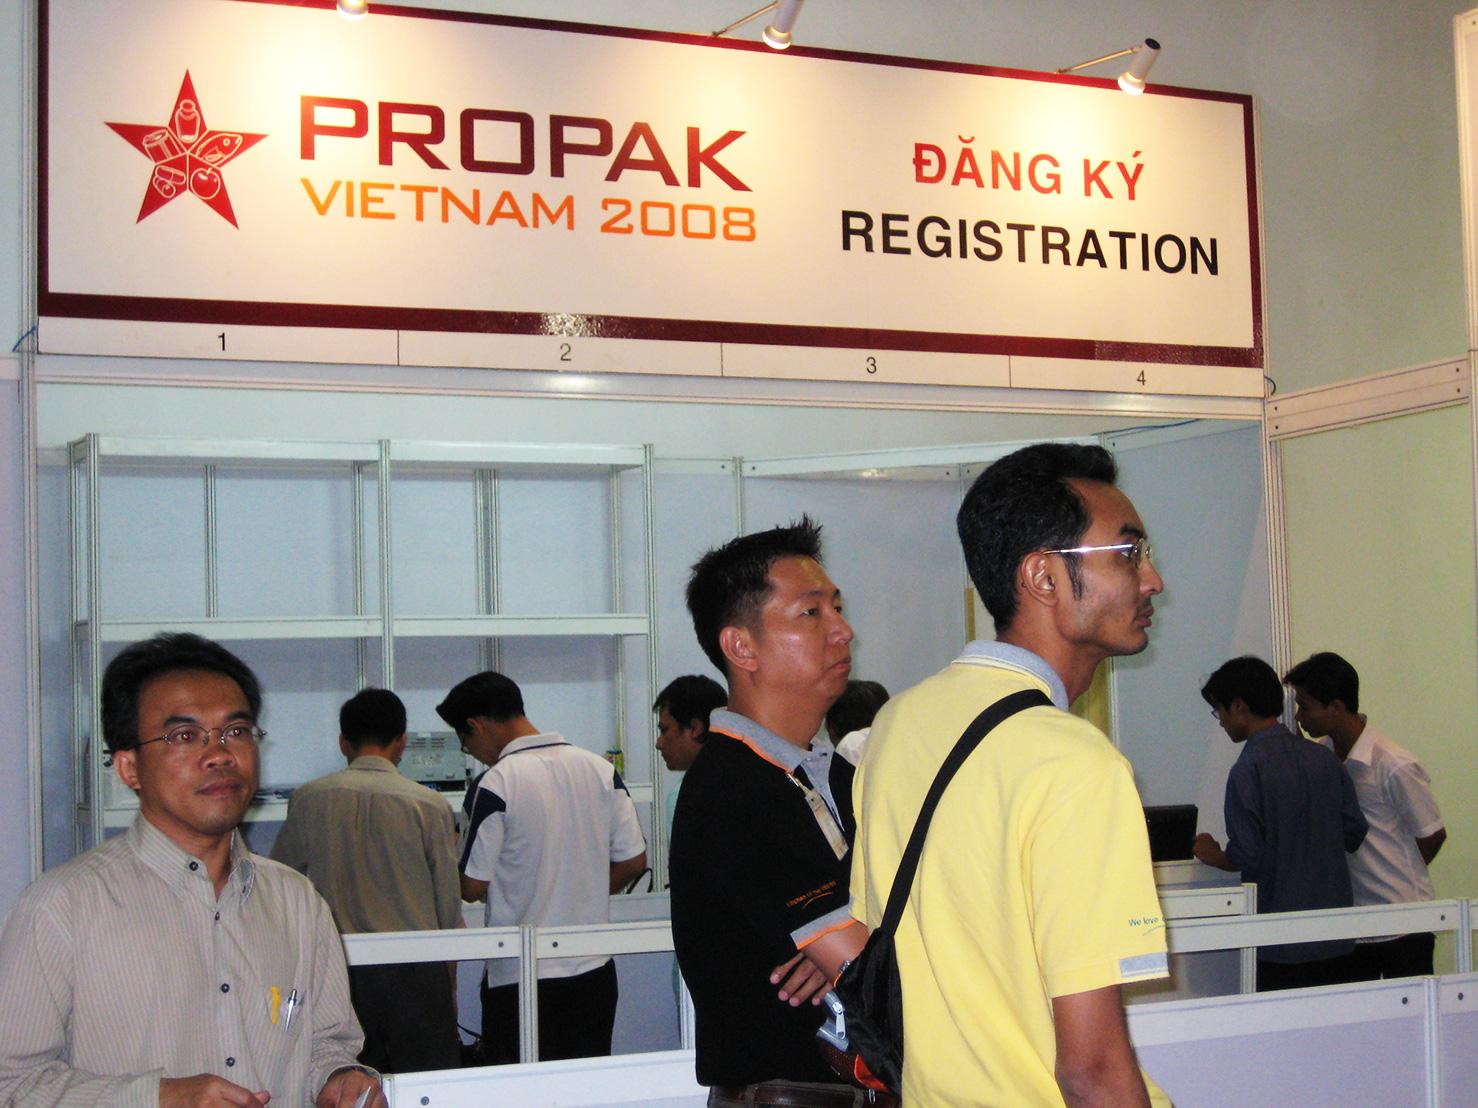 Propak Vietnam 2008